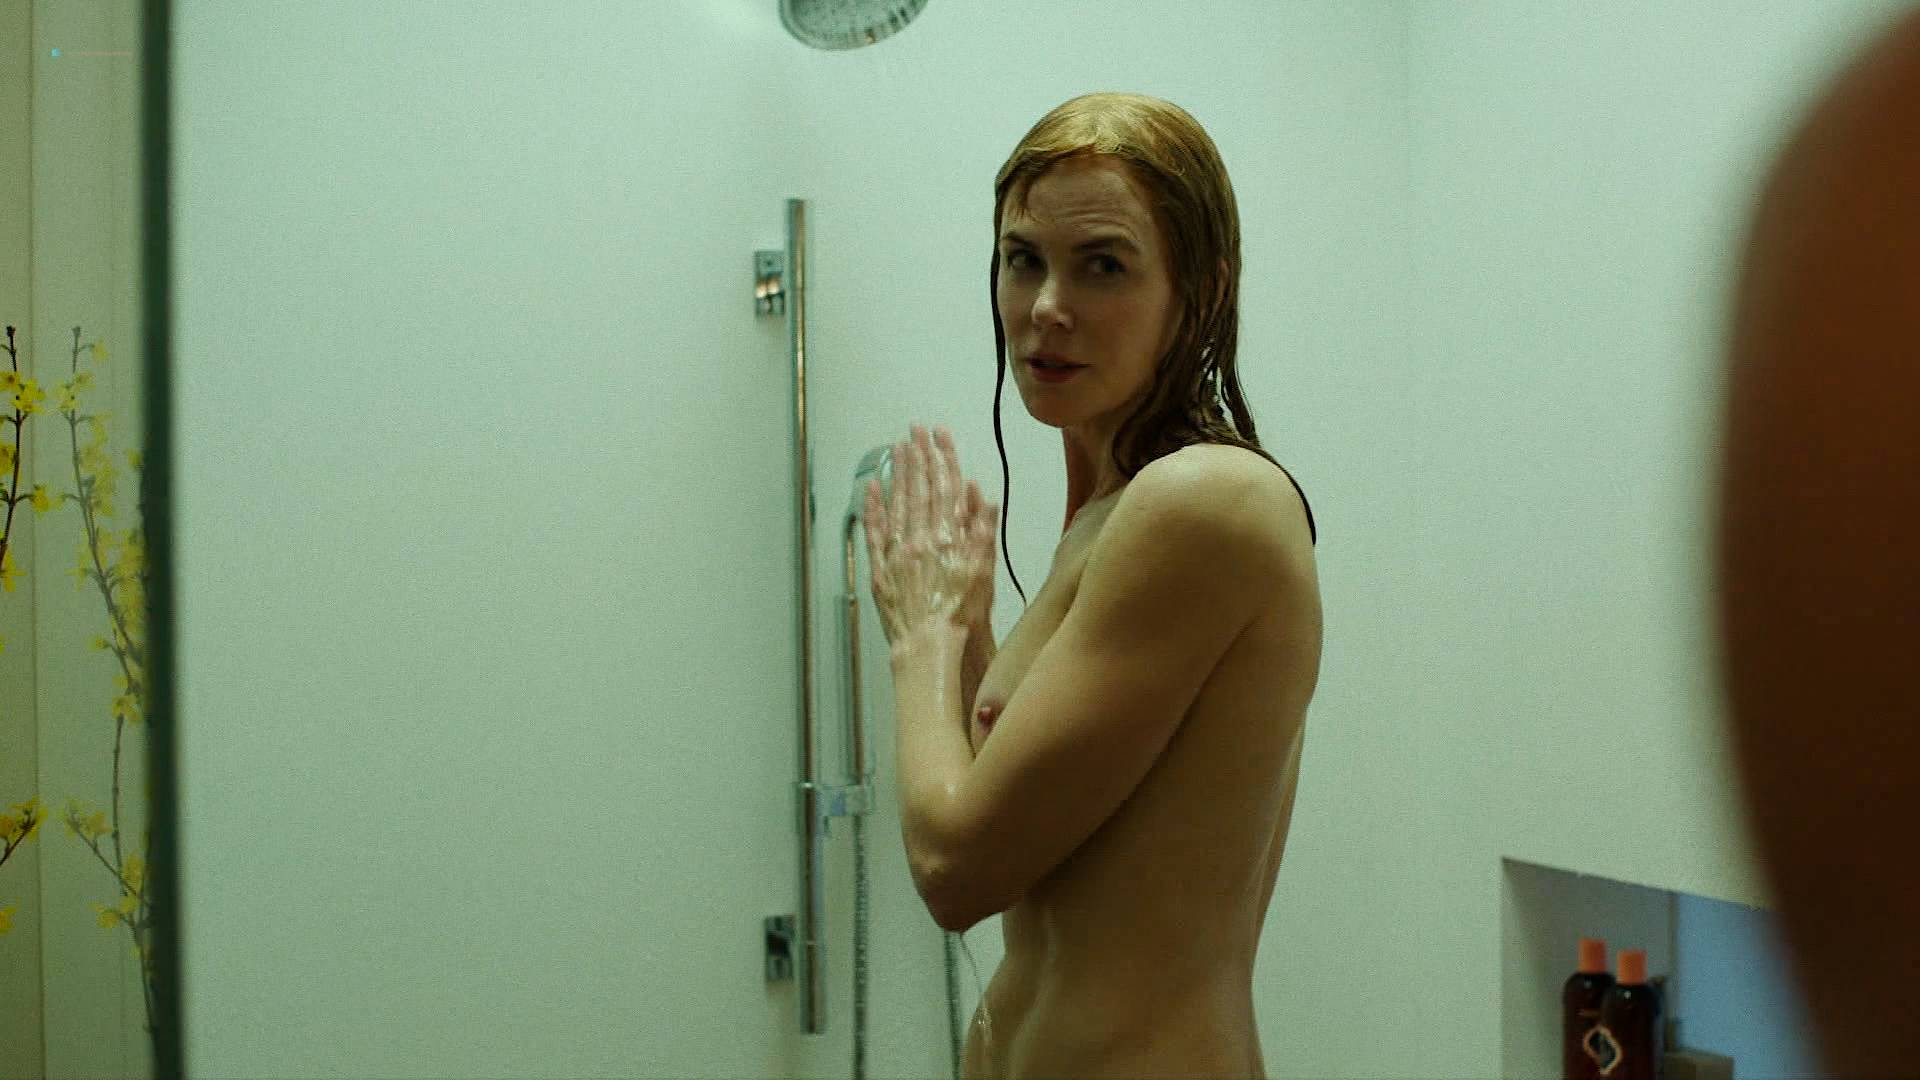 Nicole Kidman nude side boob and butt in the shower - Big Little Lies (2017) s1e7 HD 1080p Web (1)